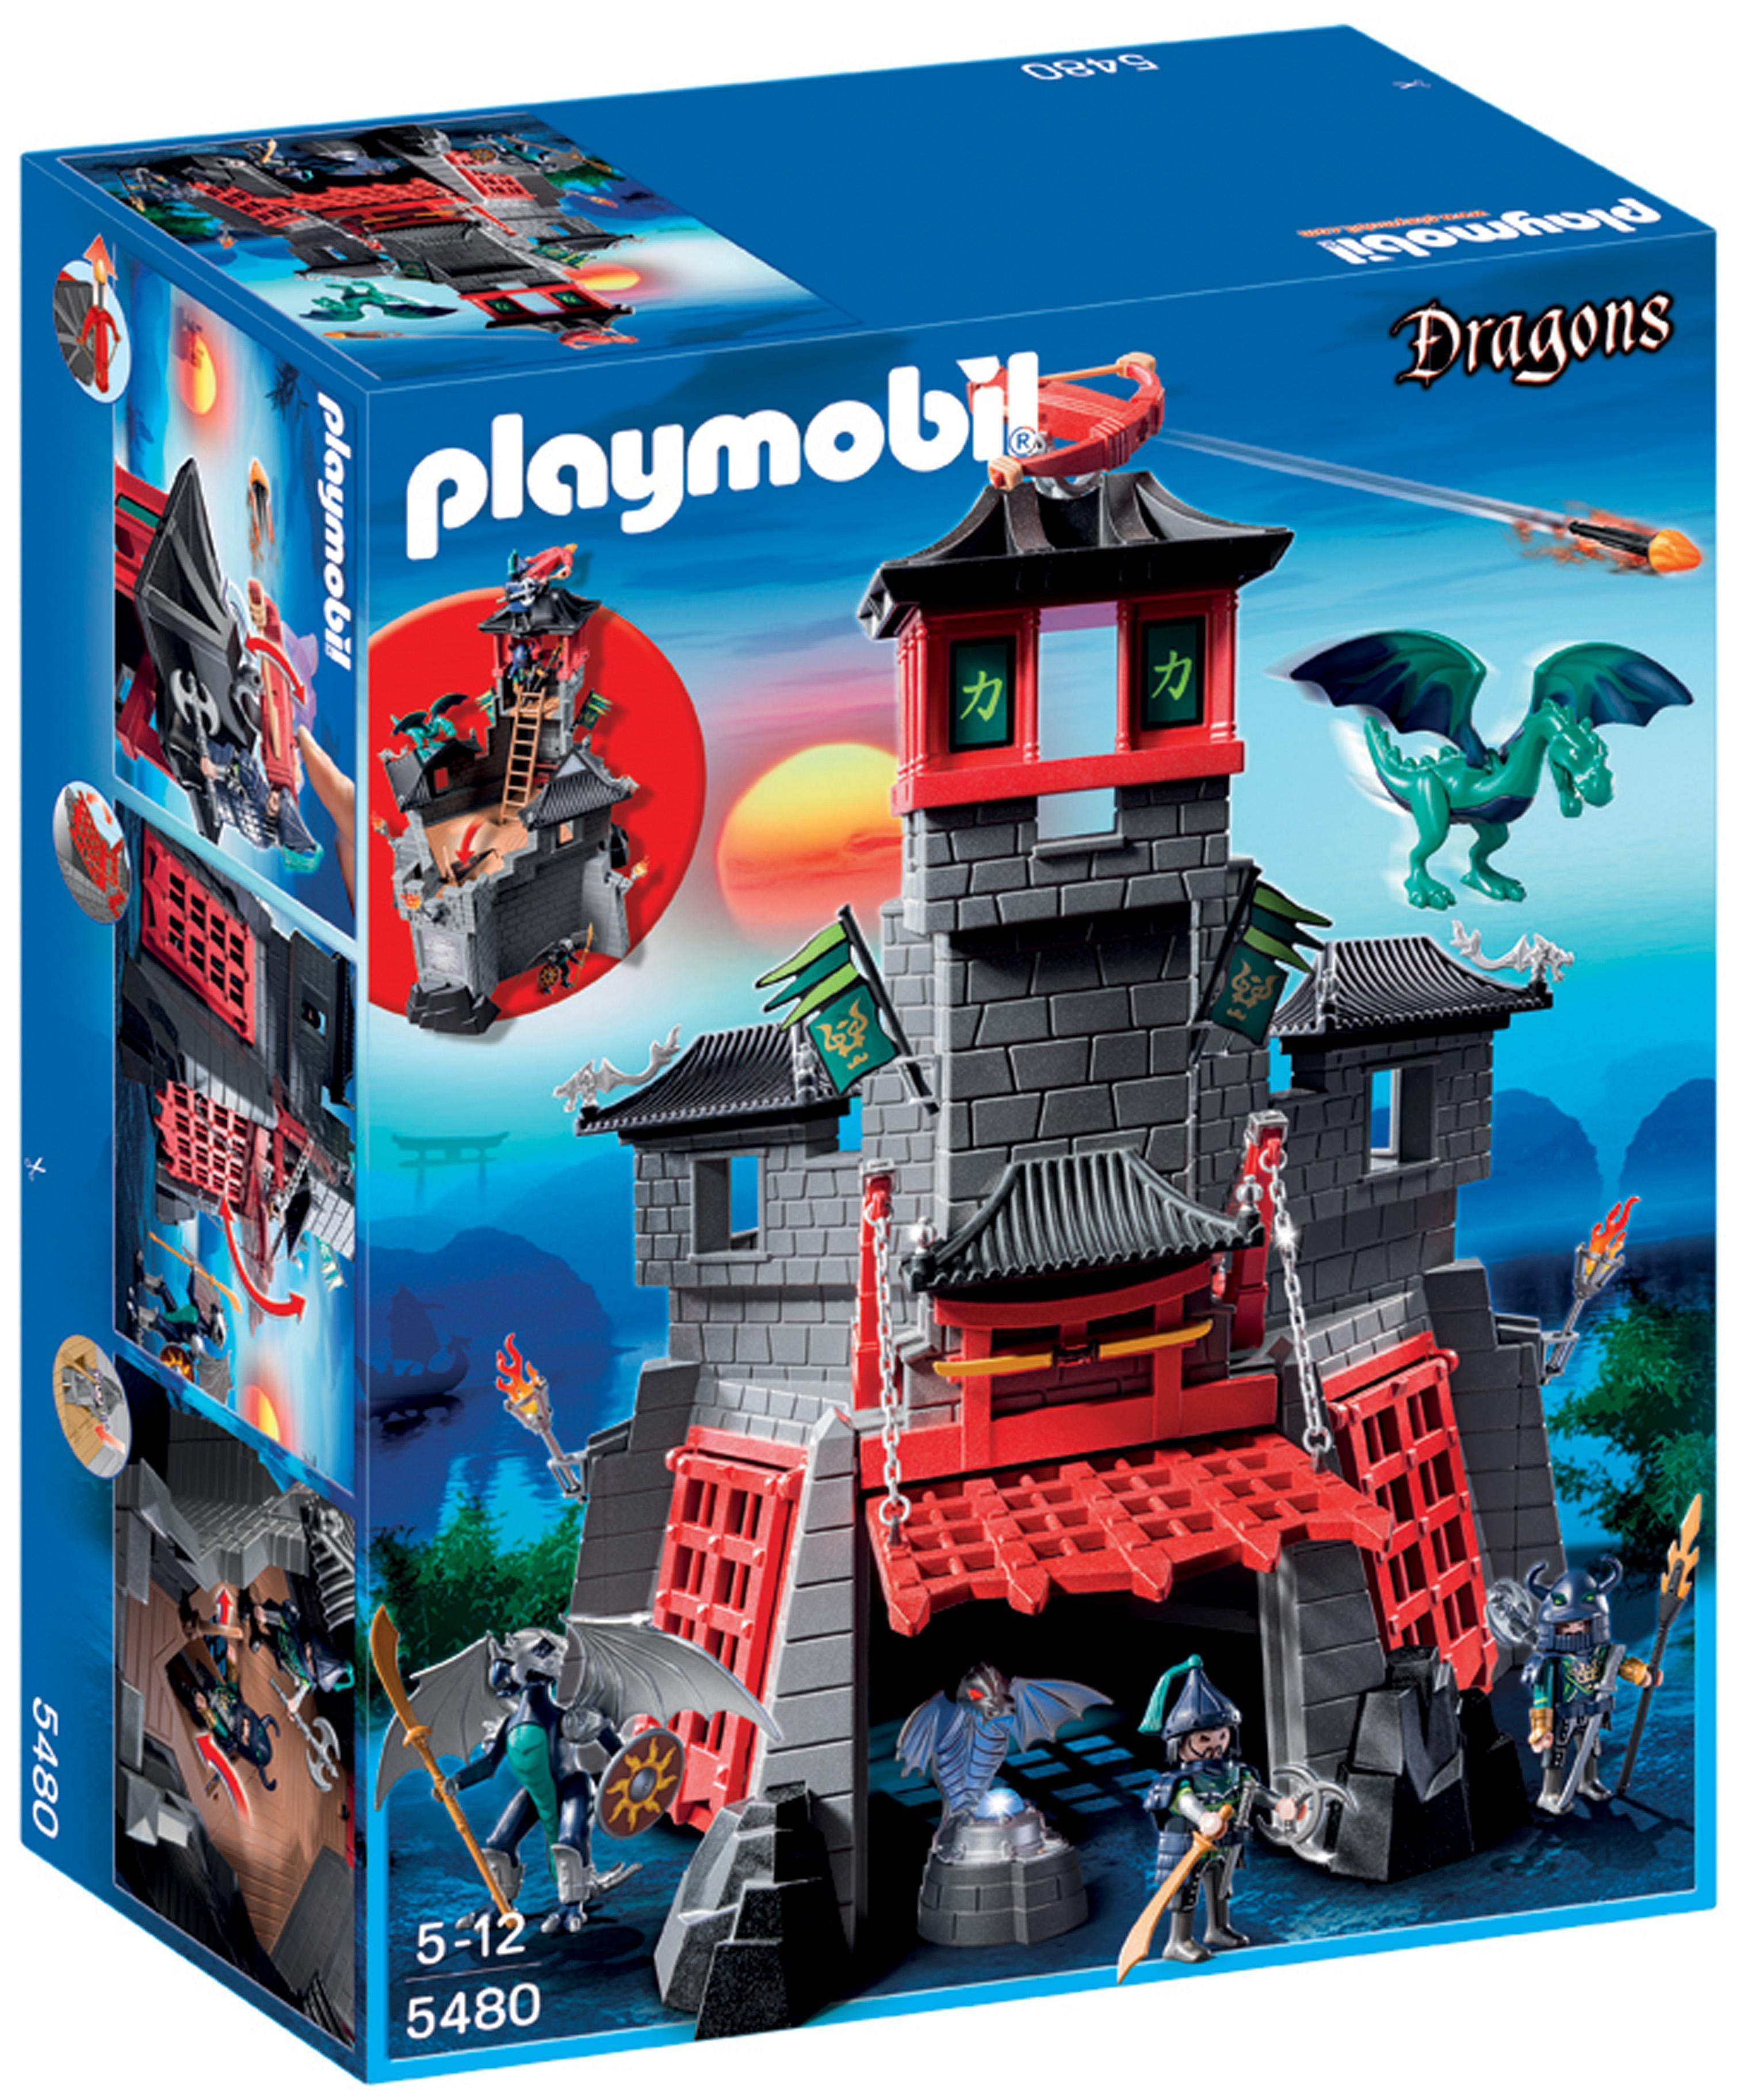 playmobil dragons lair images. Black Bedroom Furniture Sets. Home Design Ideas